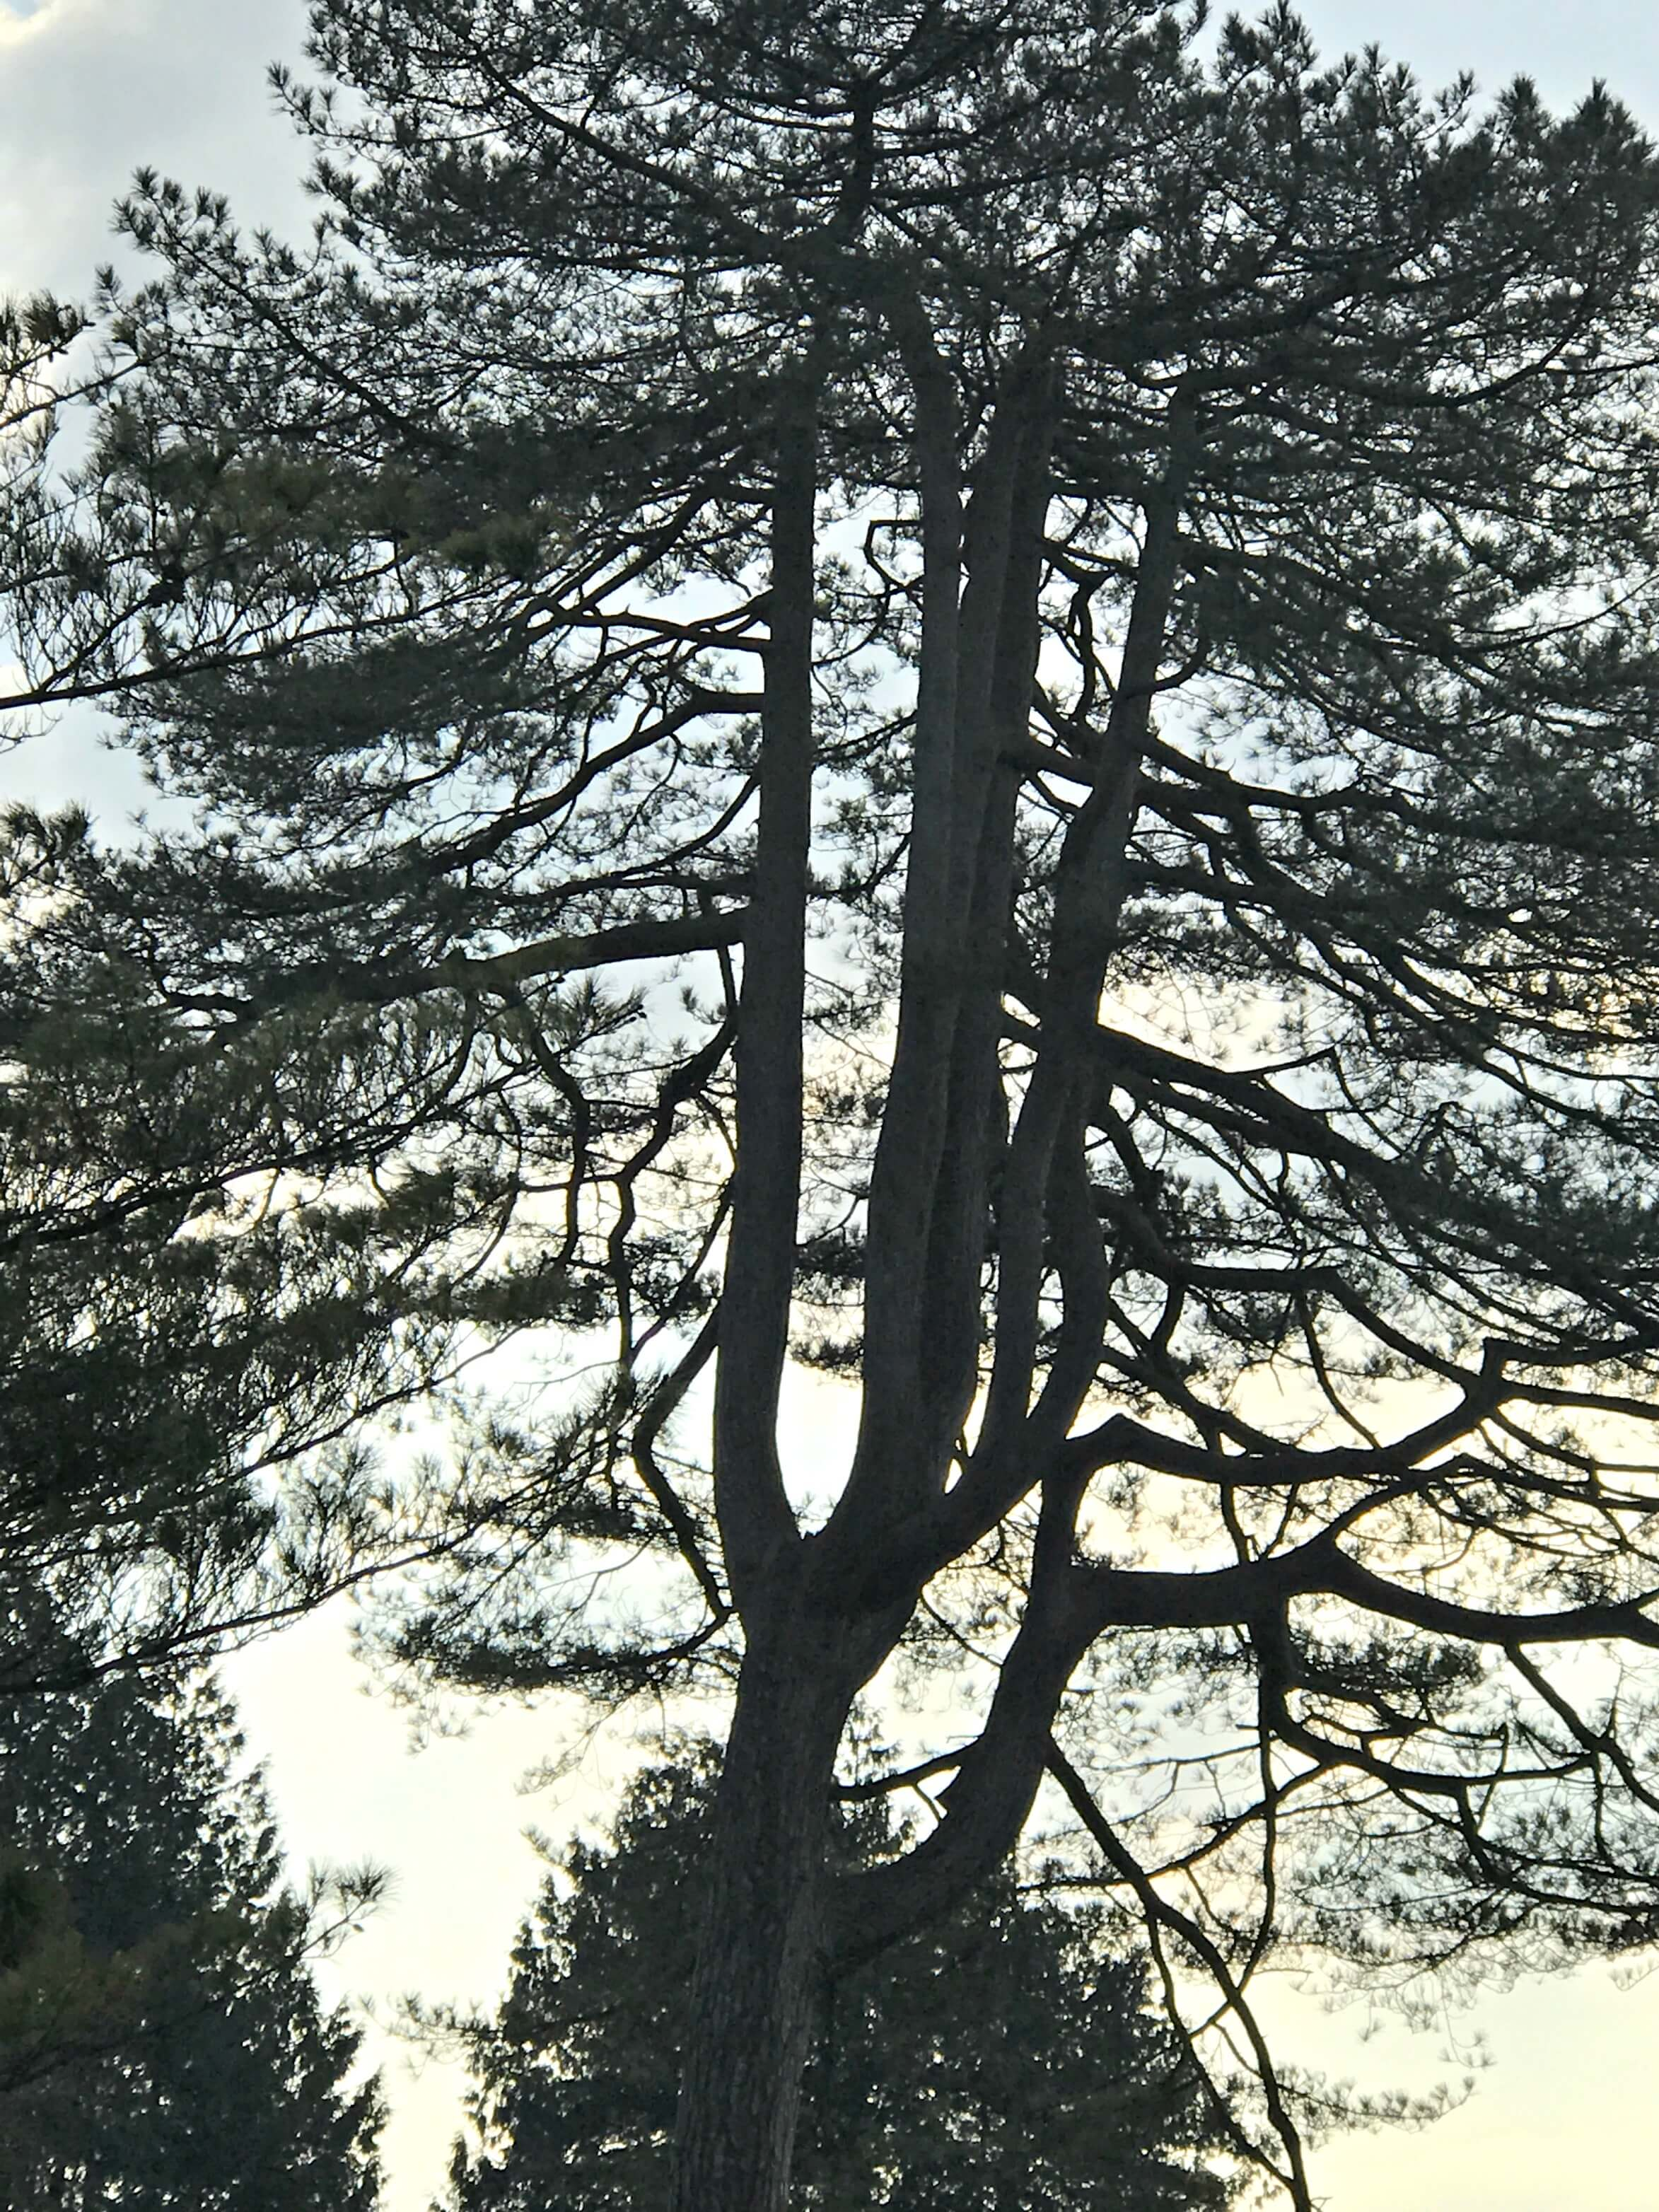 Tree at Dyffryn Gardens